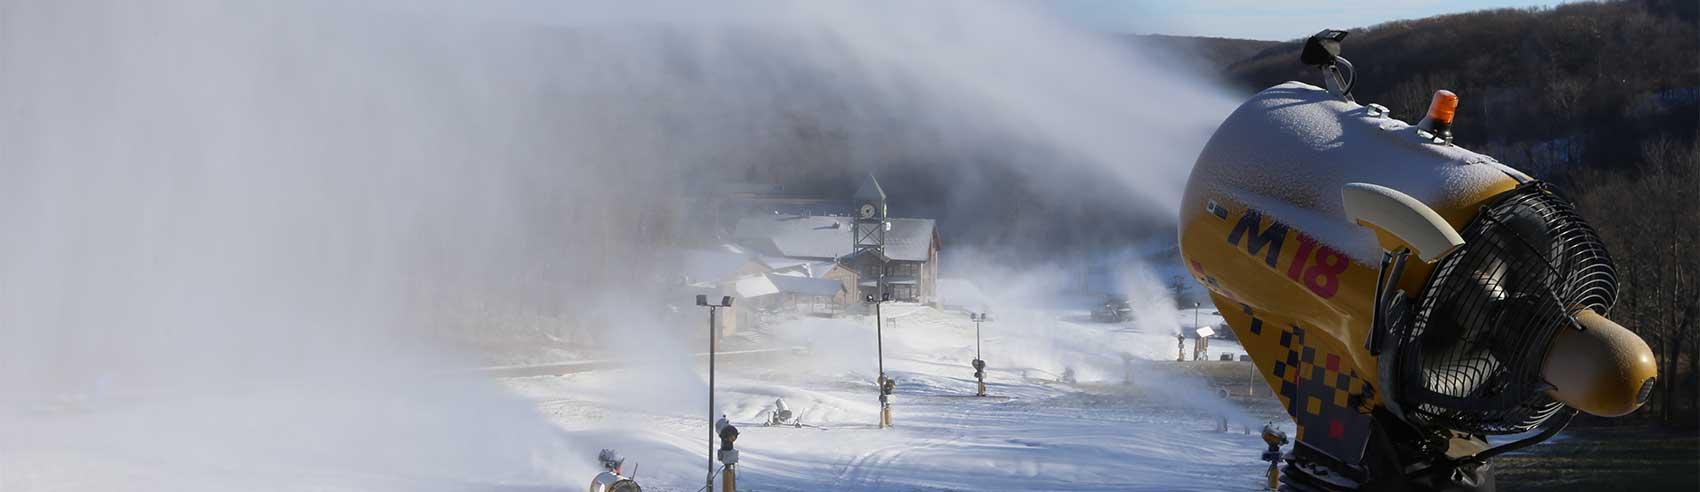 snowmaking-at-hv-120617-1